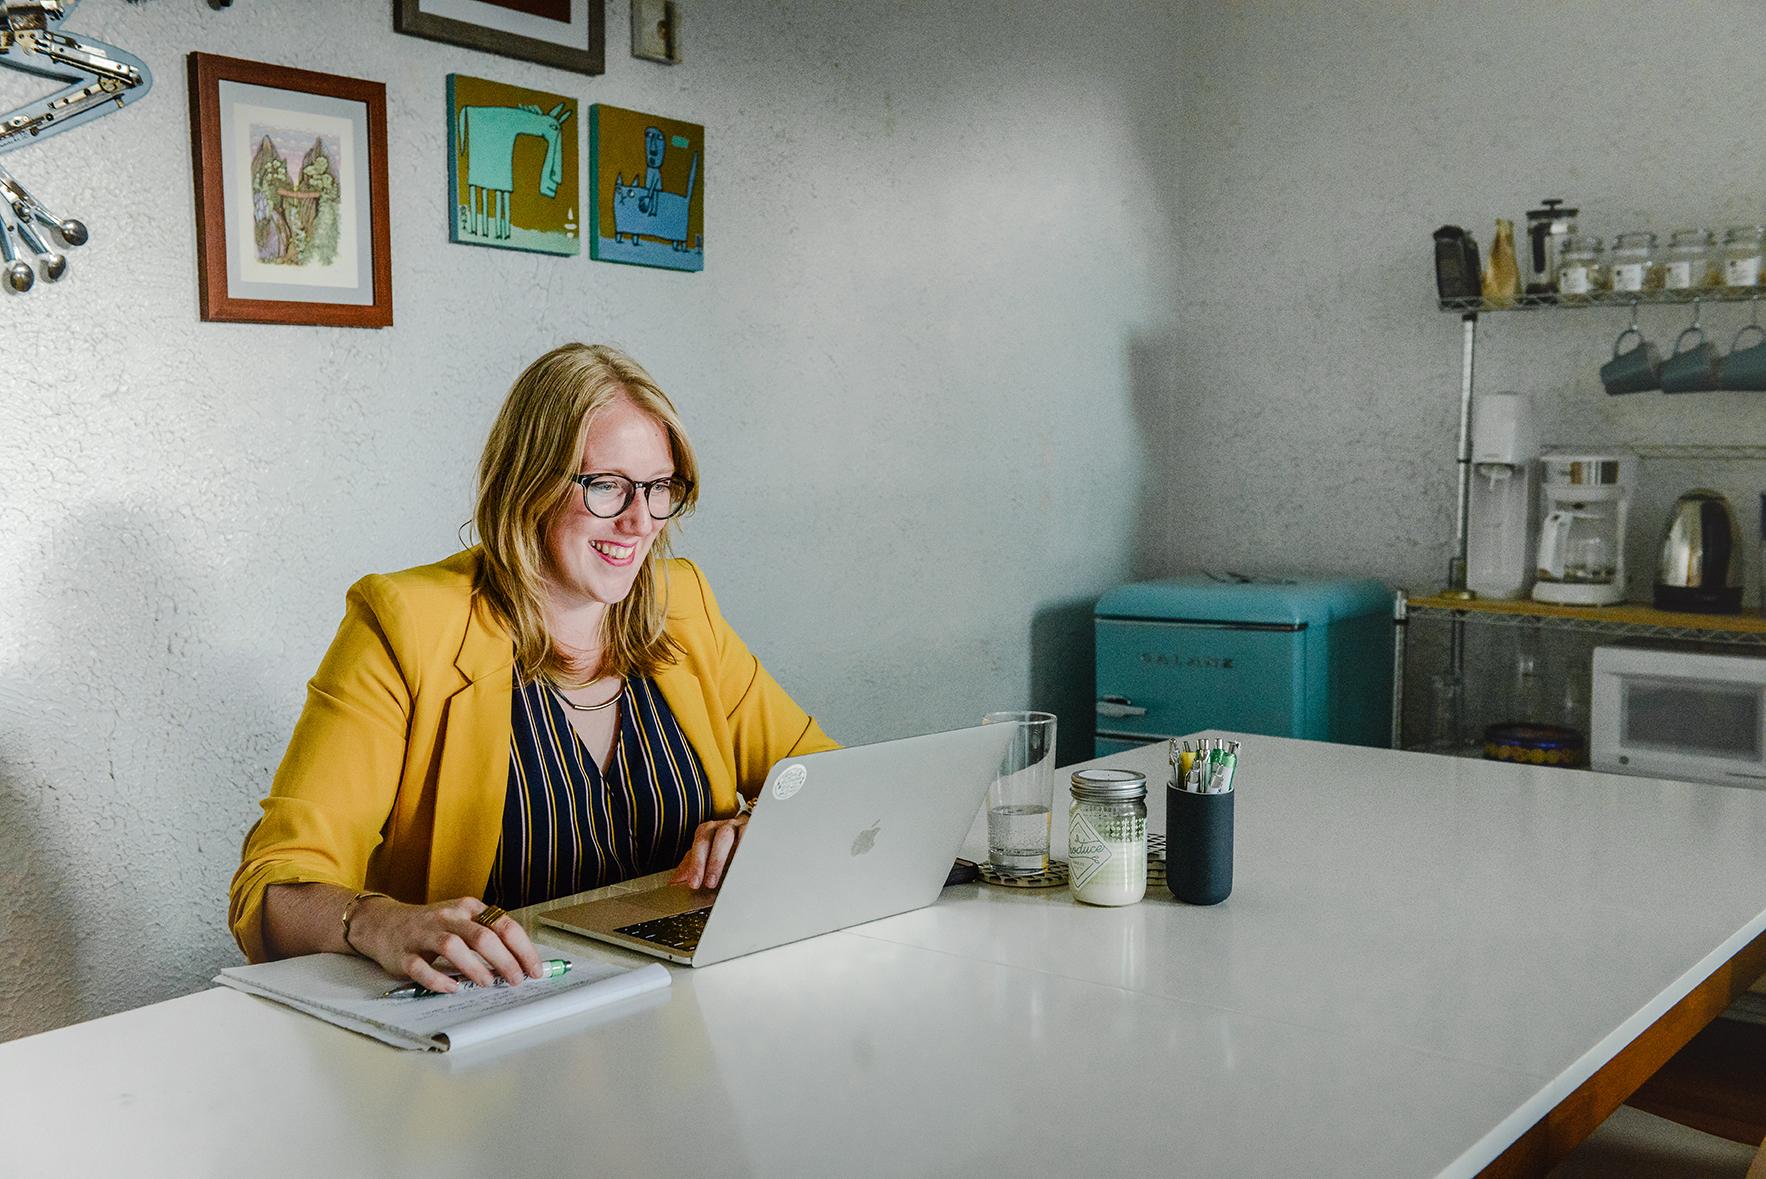 Marlene van Nelson doing work at a computer at her desk